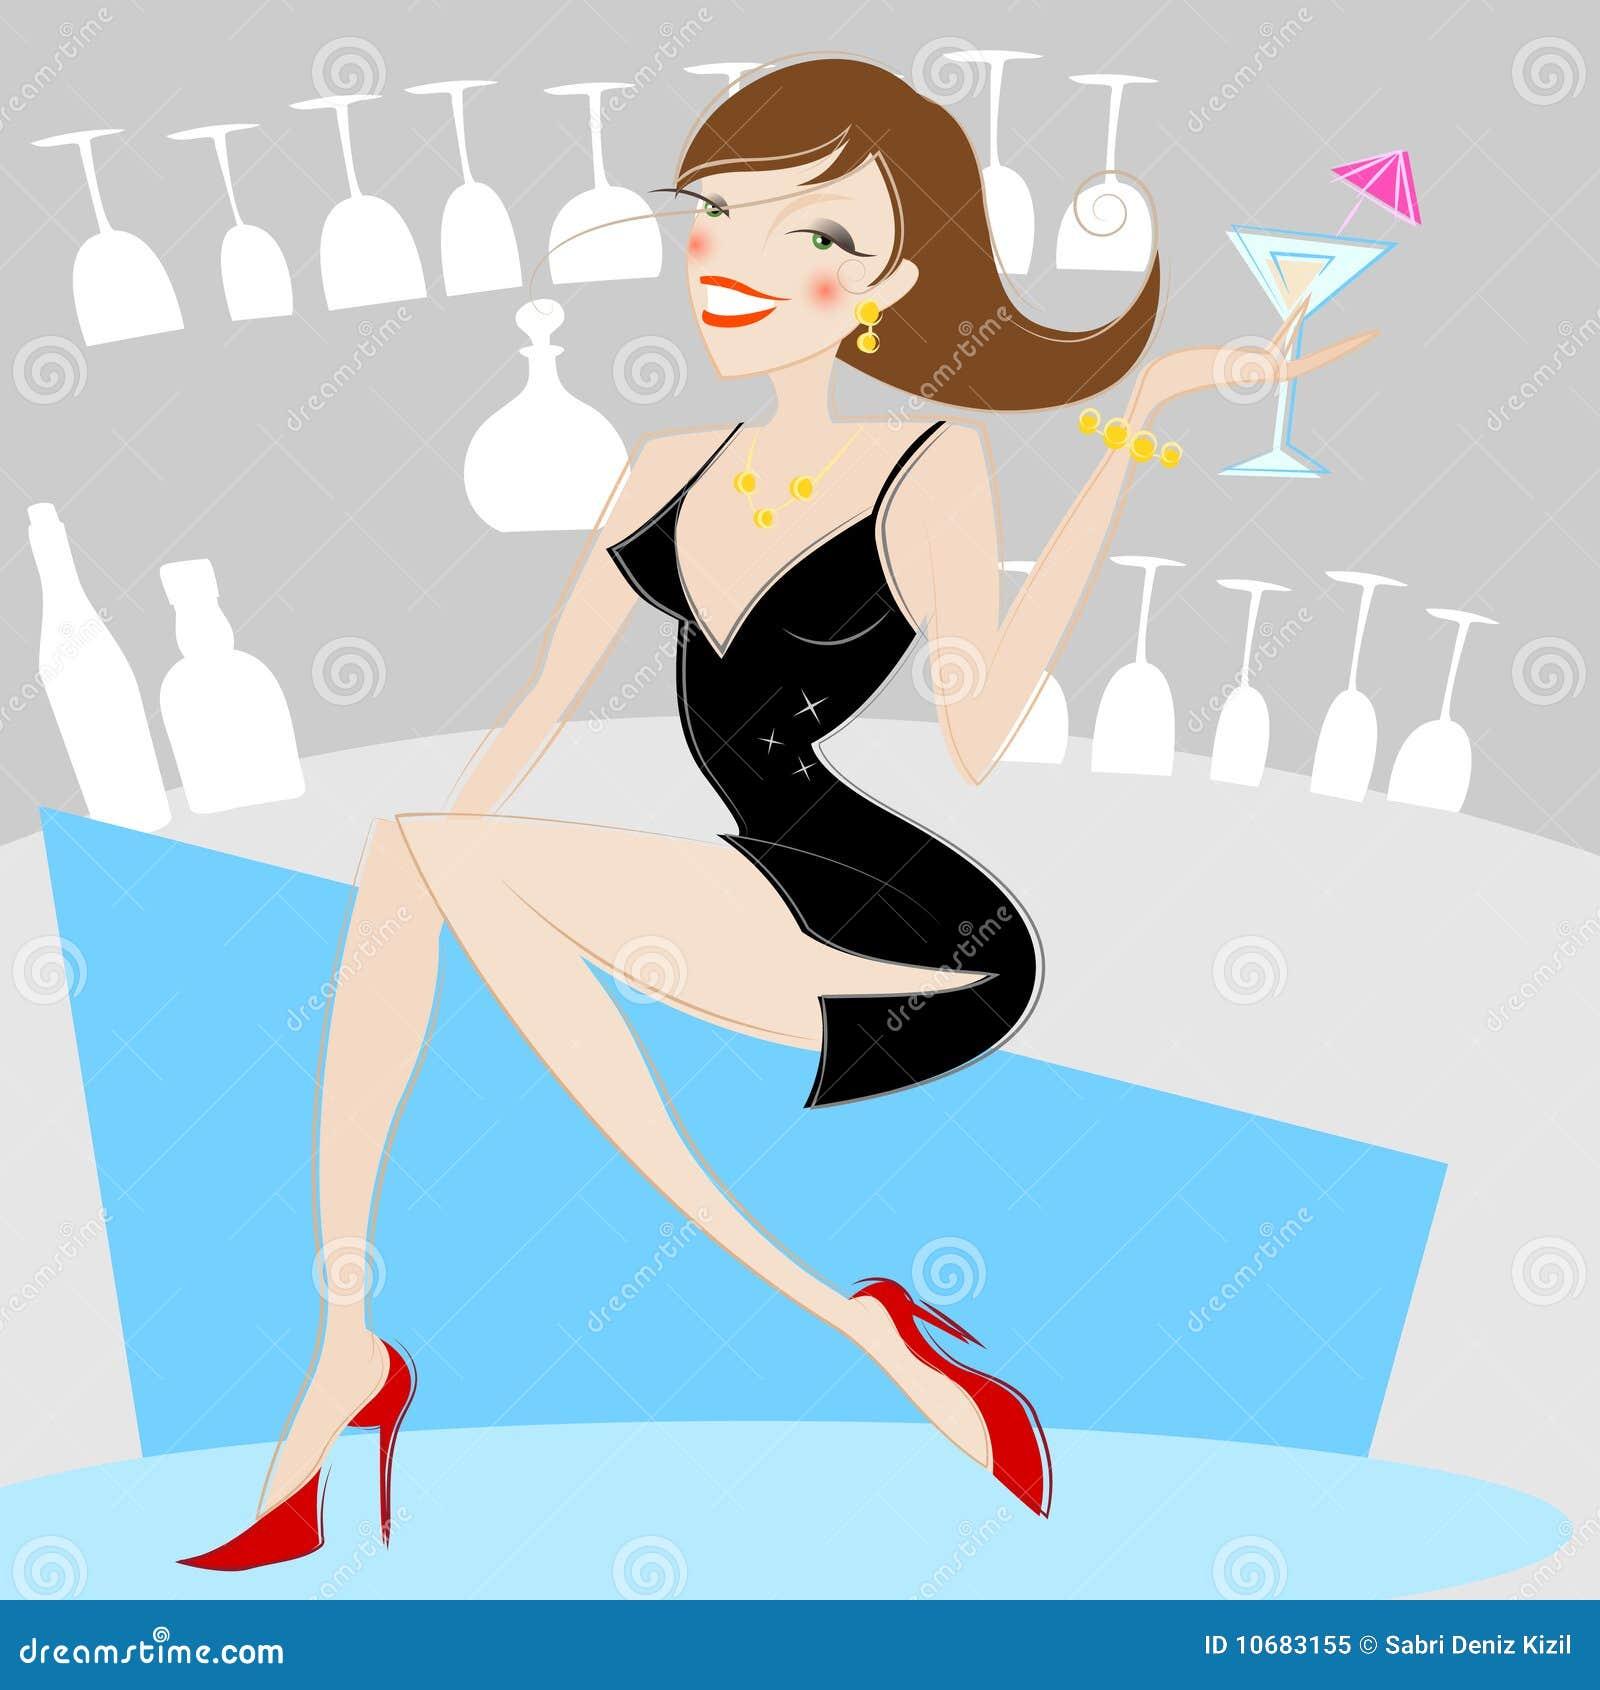 girl drinking alcohol stock vector illustration of